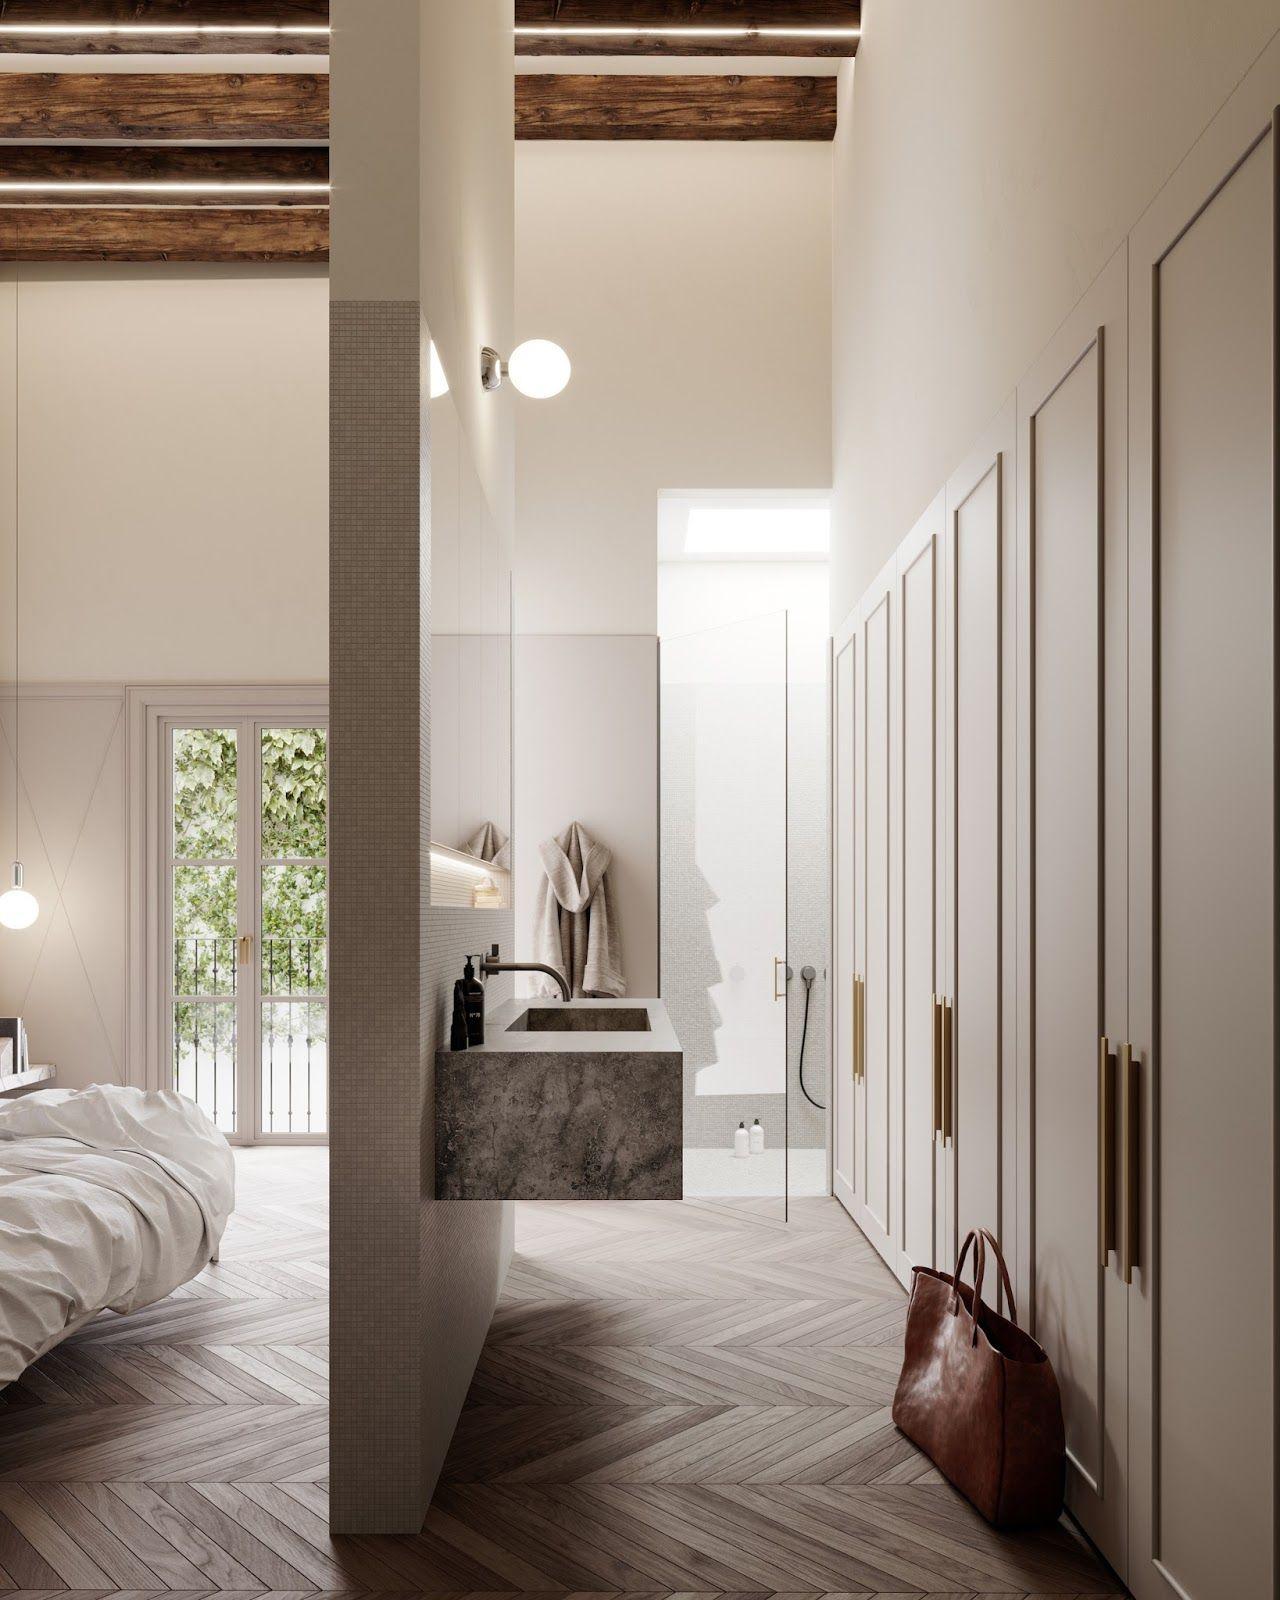 Lista De Plataformas Com Cursos De Design Online Slaapkamer Ontwerp Slaapkamer Interieur Interieur Slaapkamer